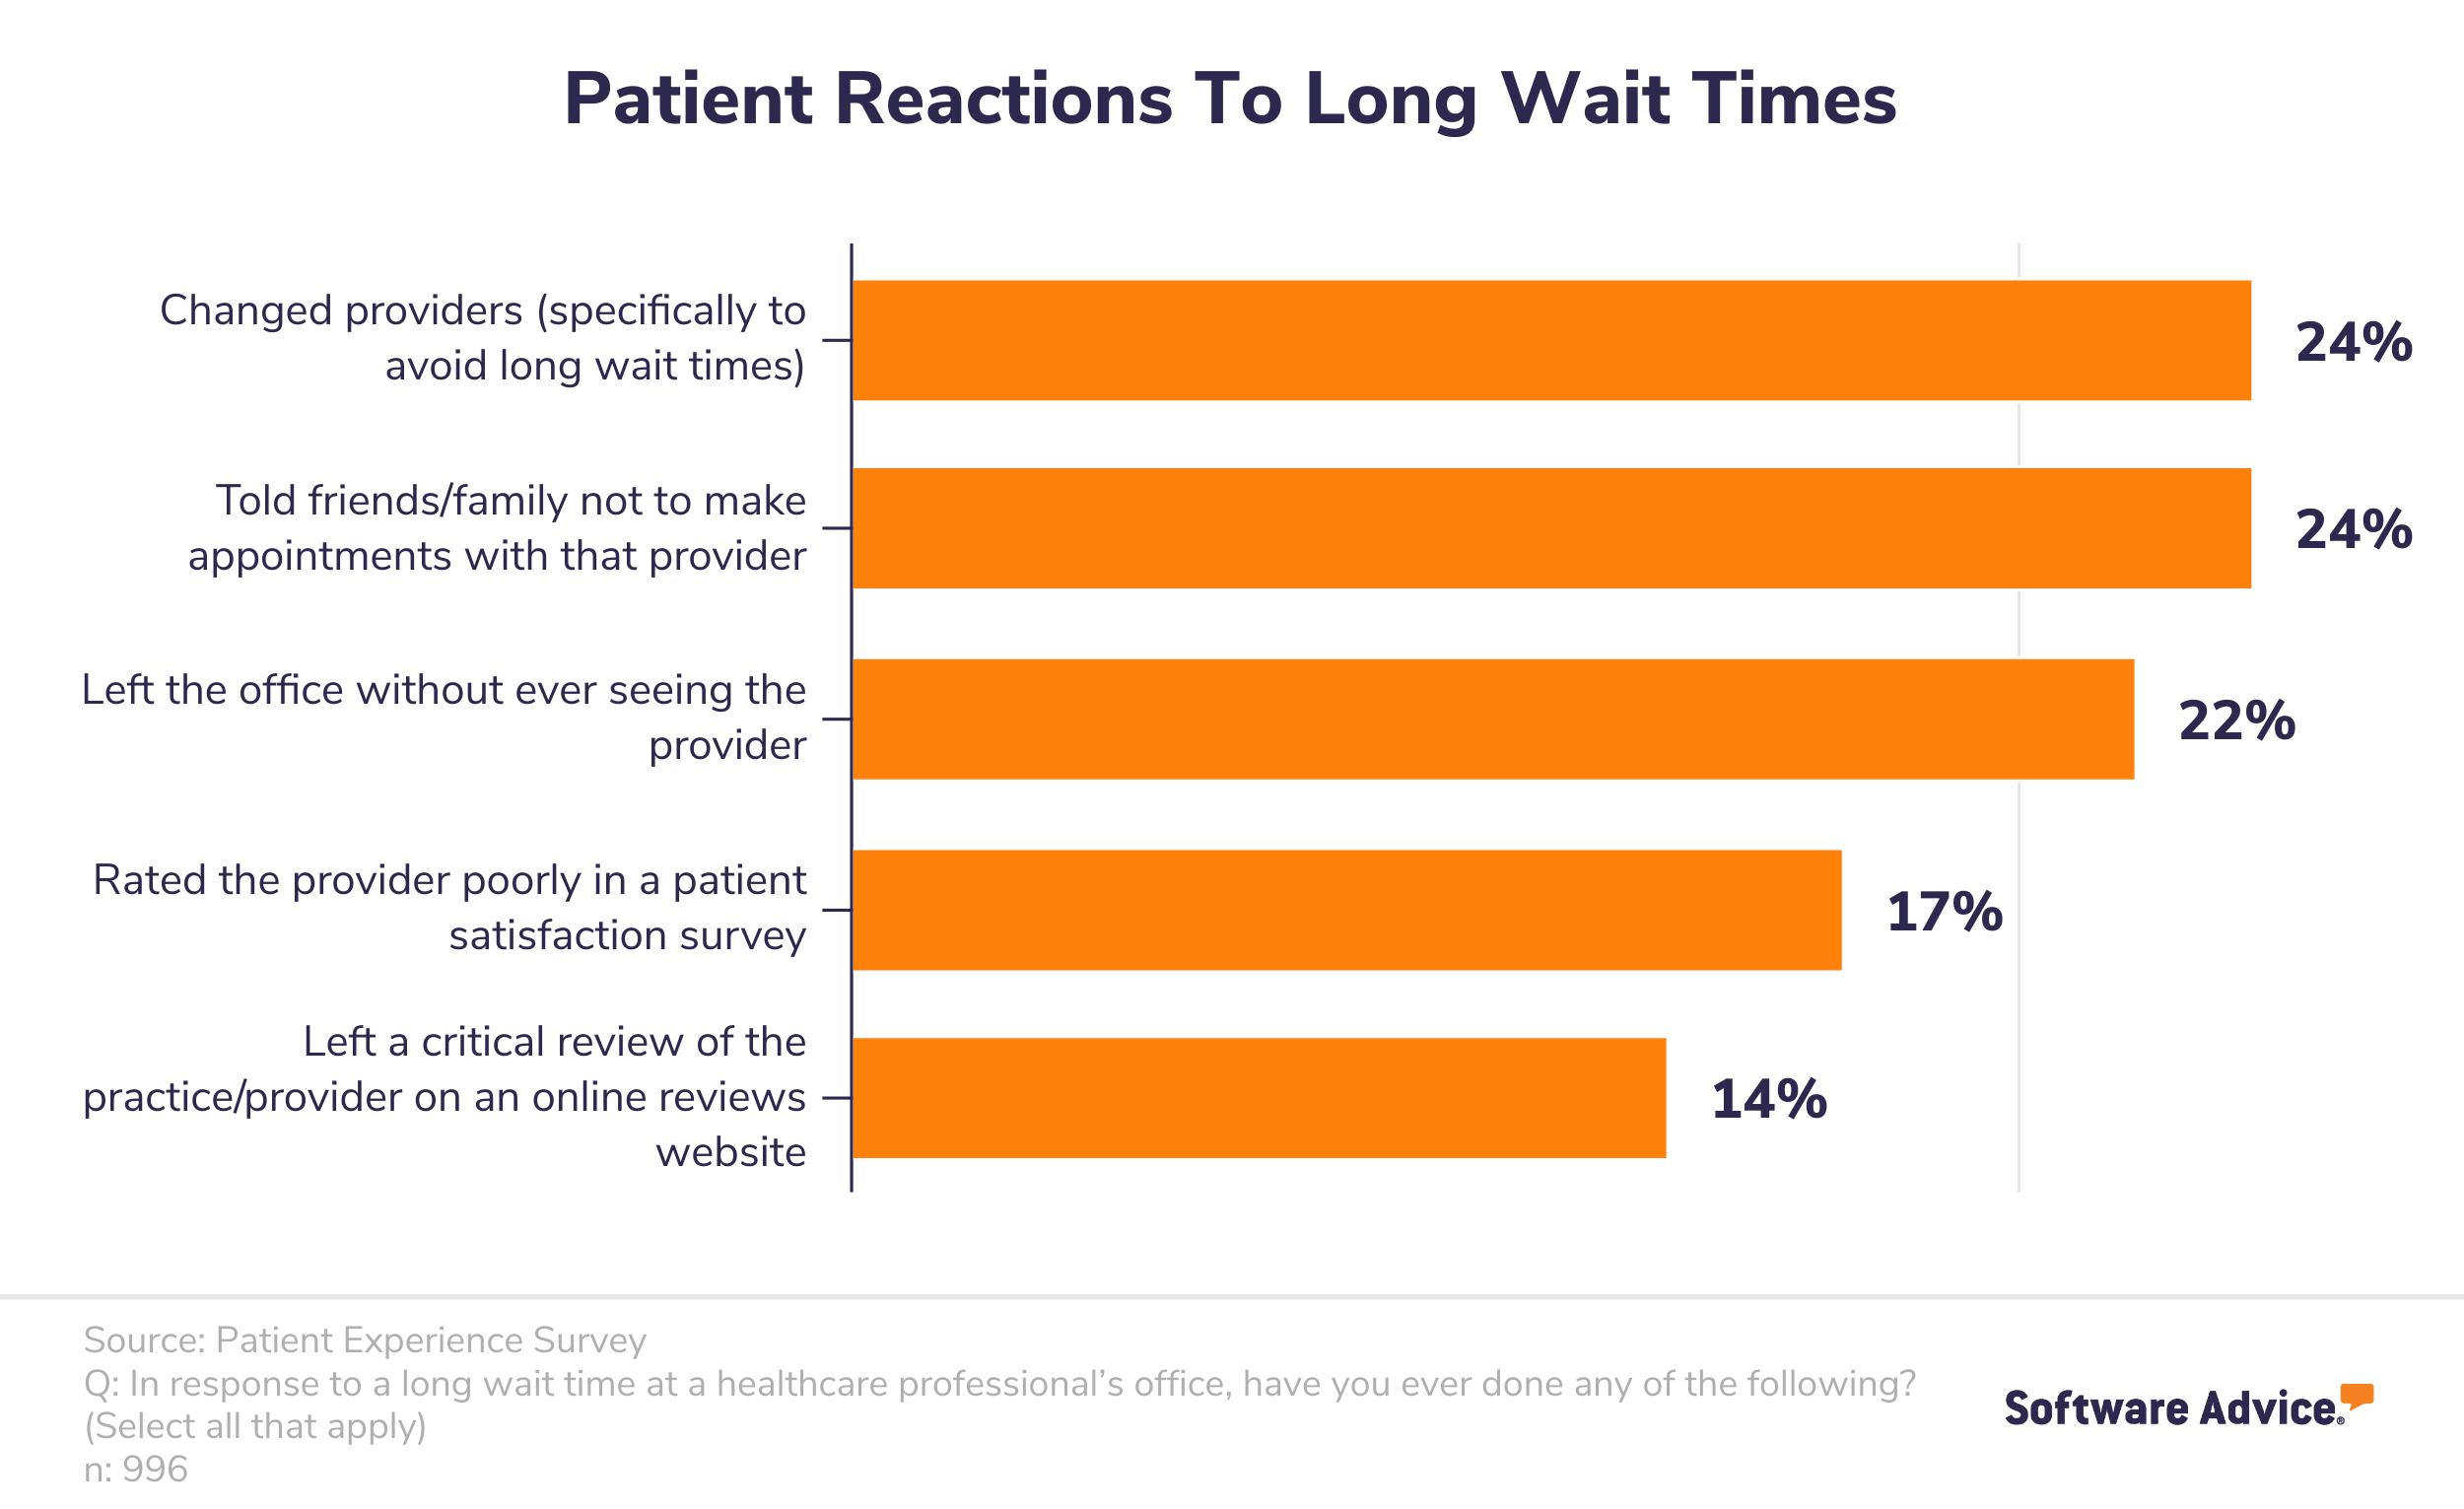 Common patient reactions to long wait times